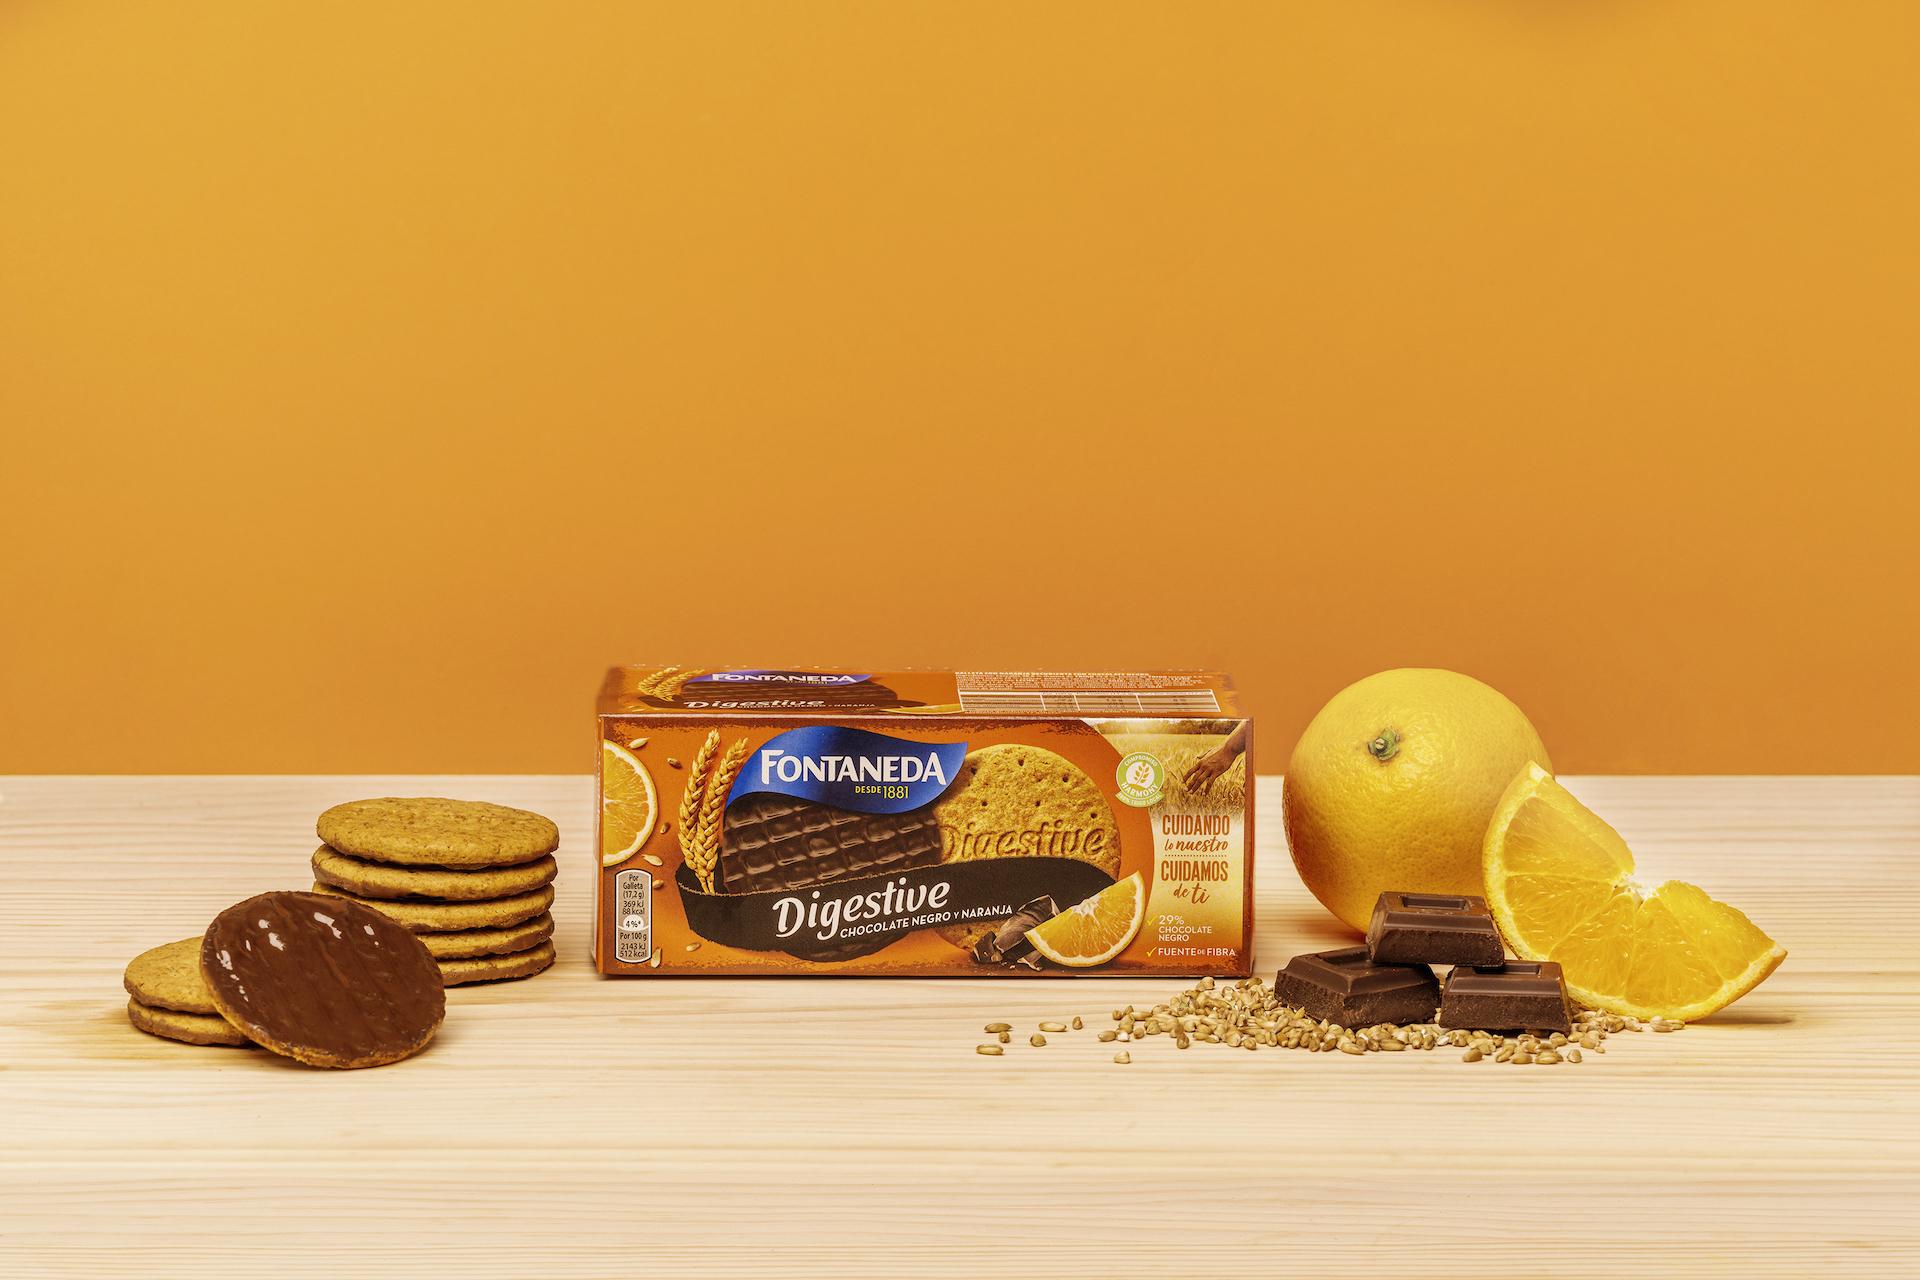 Digestive Chocolate Negro y Naranja